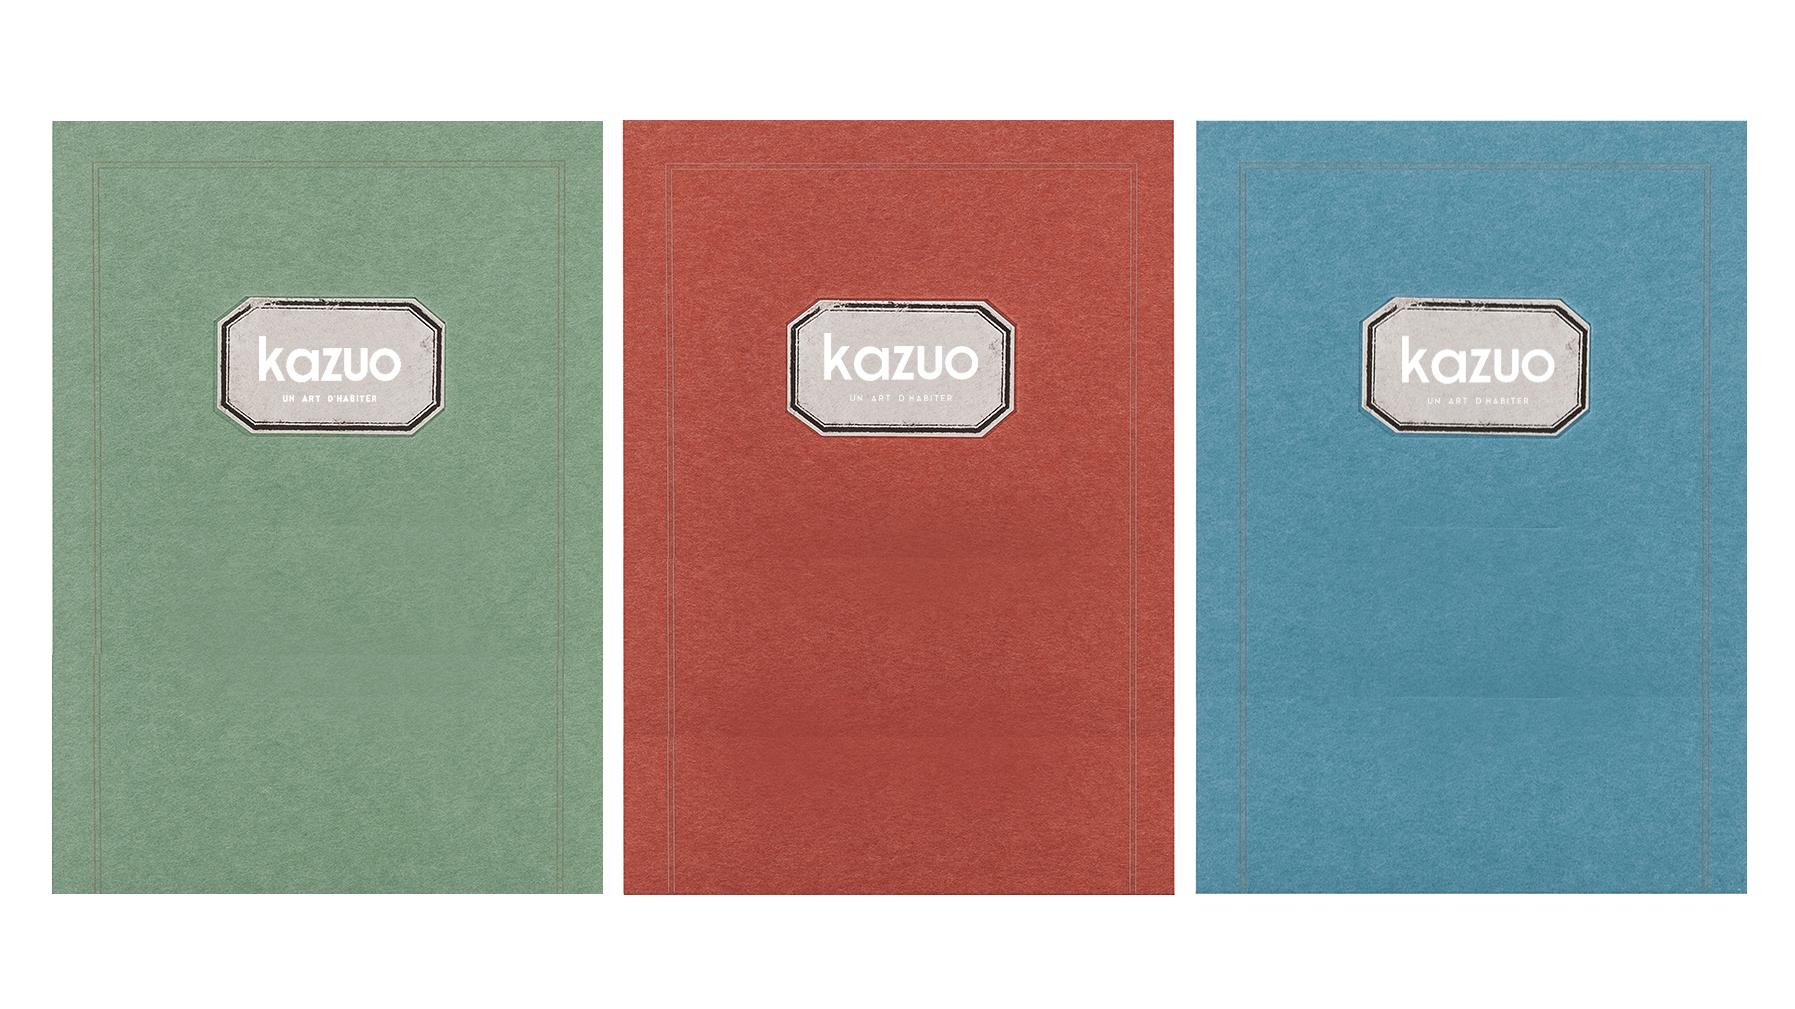 KAZUO_Carnets-1517316416.jpg